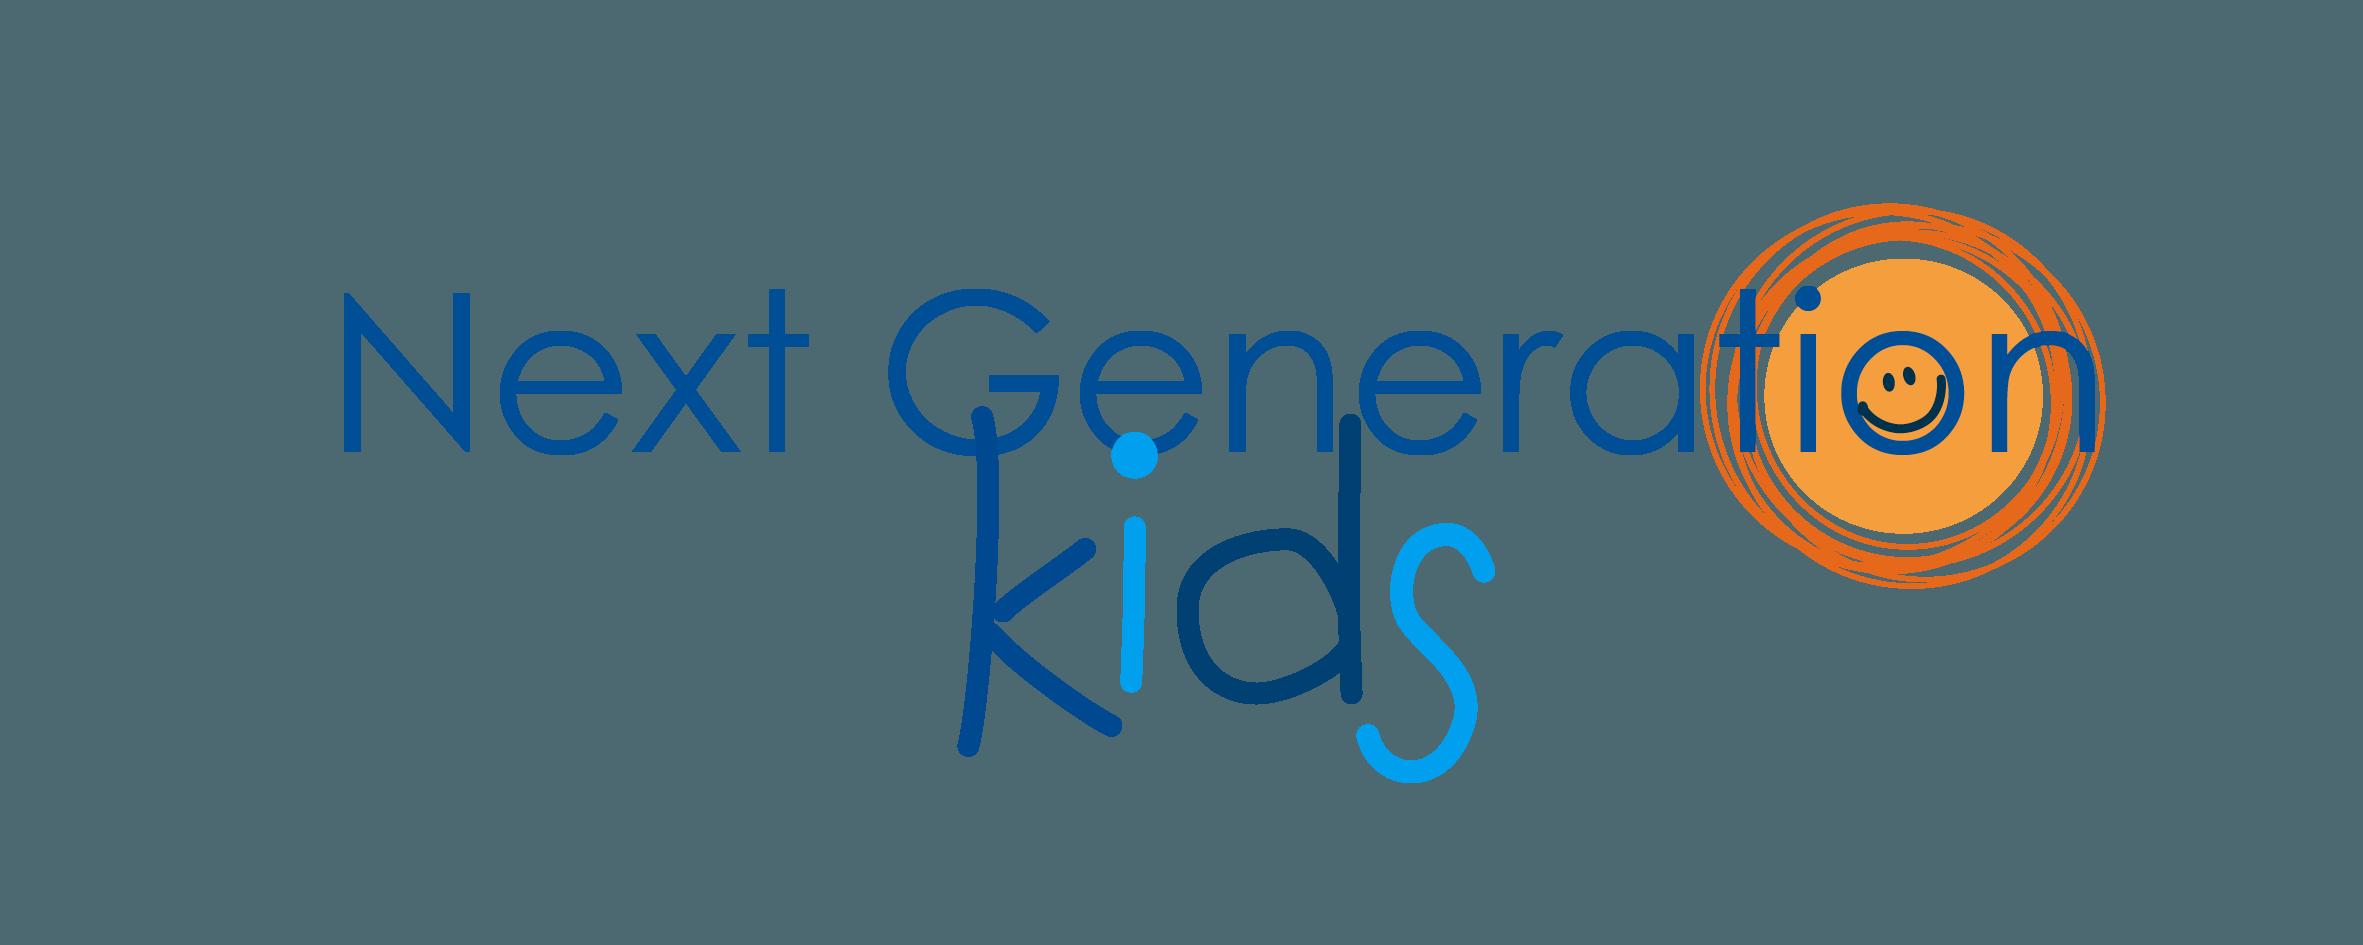 next generation kids logo